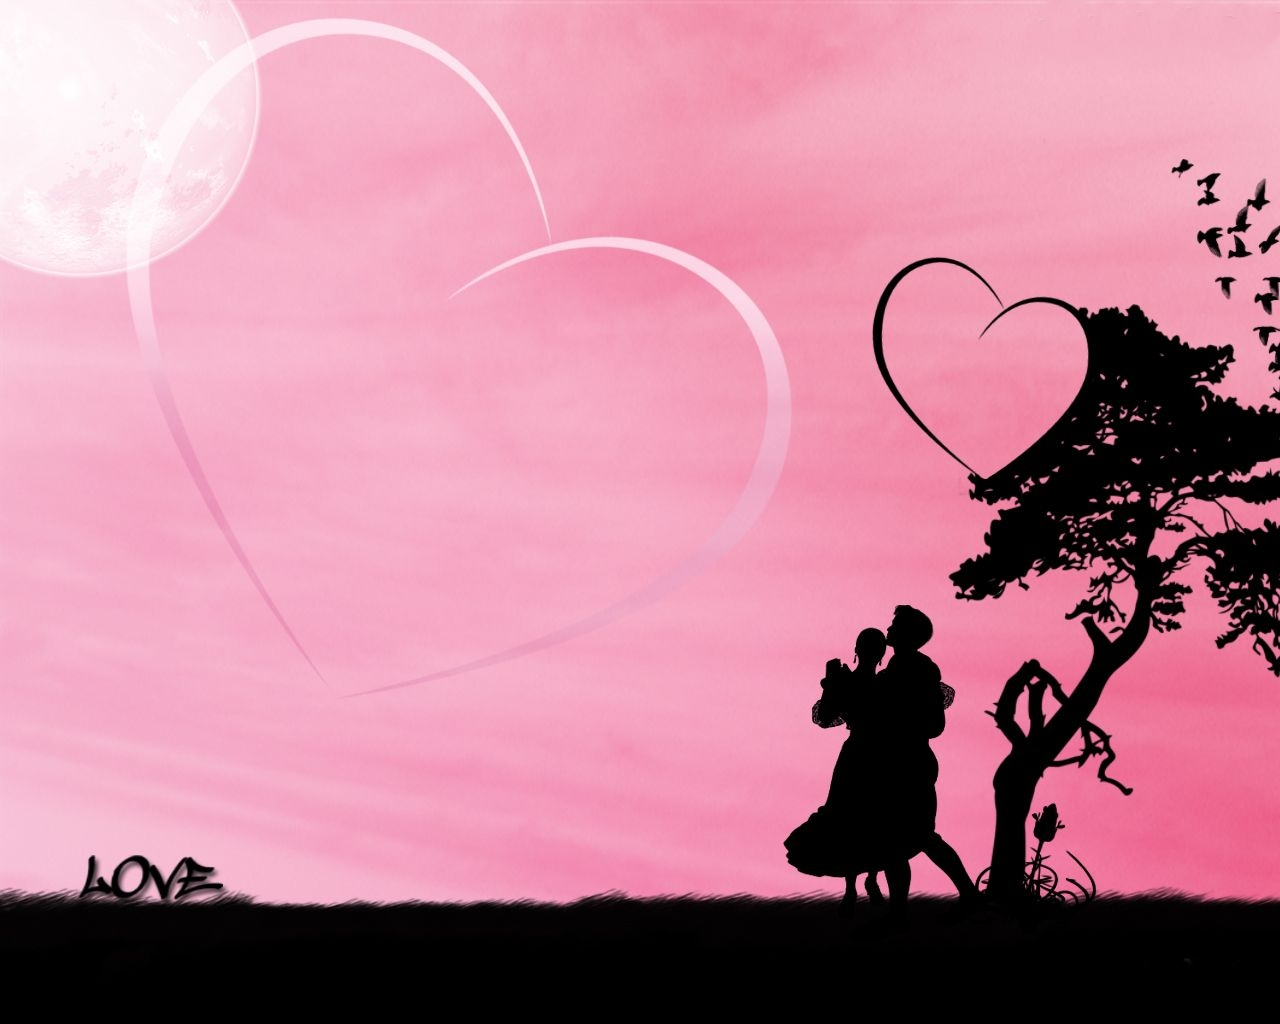 Wallpaper De Violetta Disney Wallpaper Lovers - HD Wallpapers